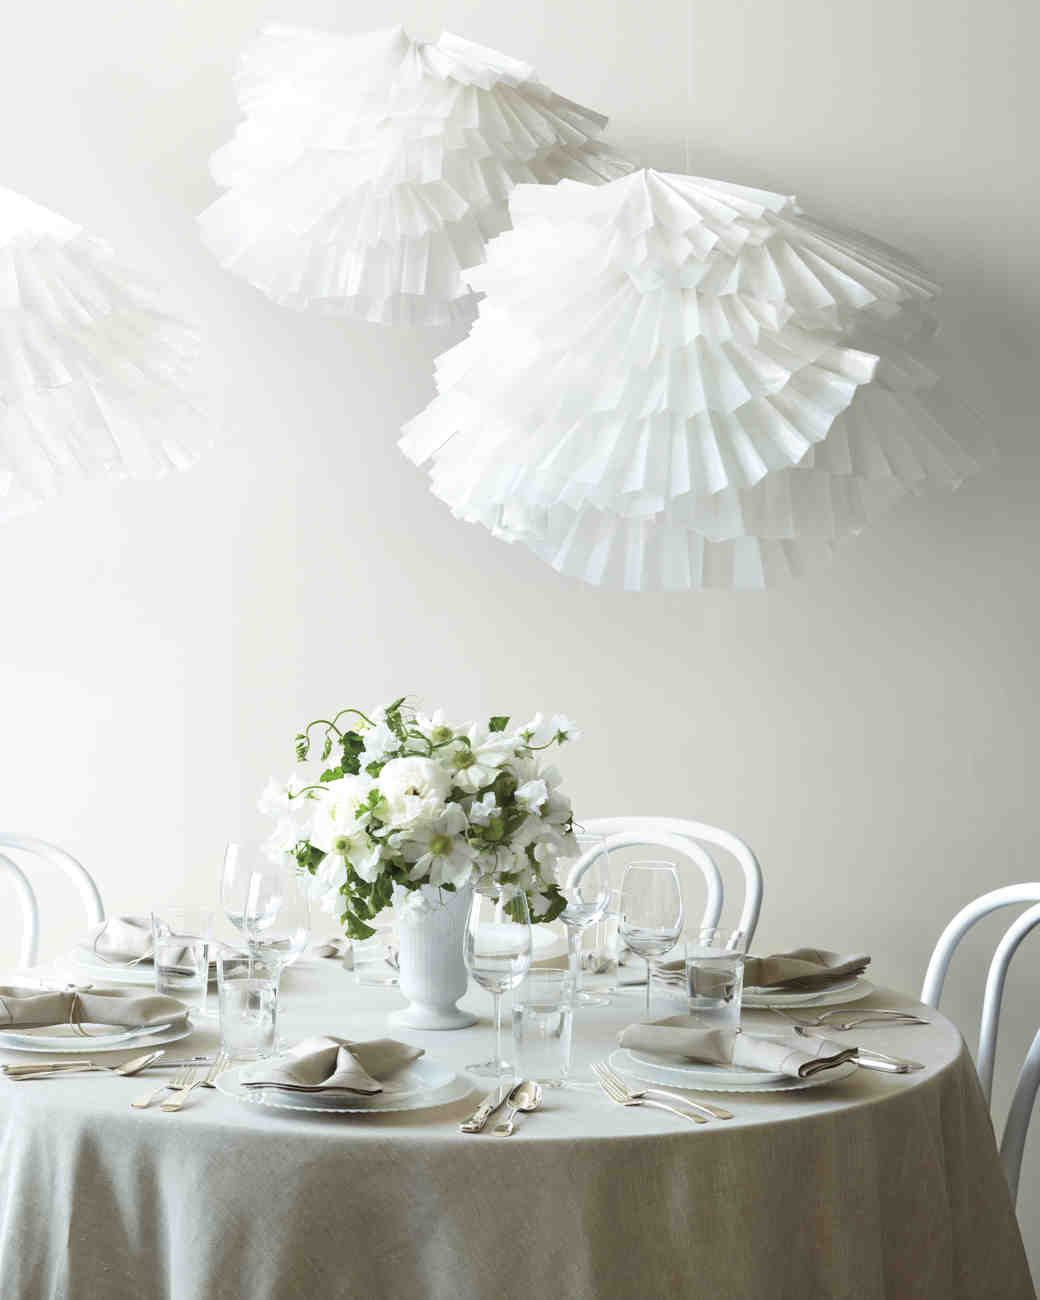 Martha stewart weddings ideas home decorating ideas - Home room ideas